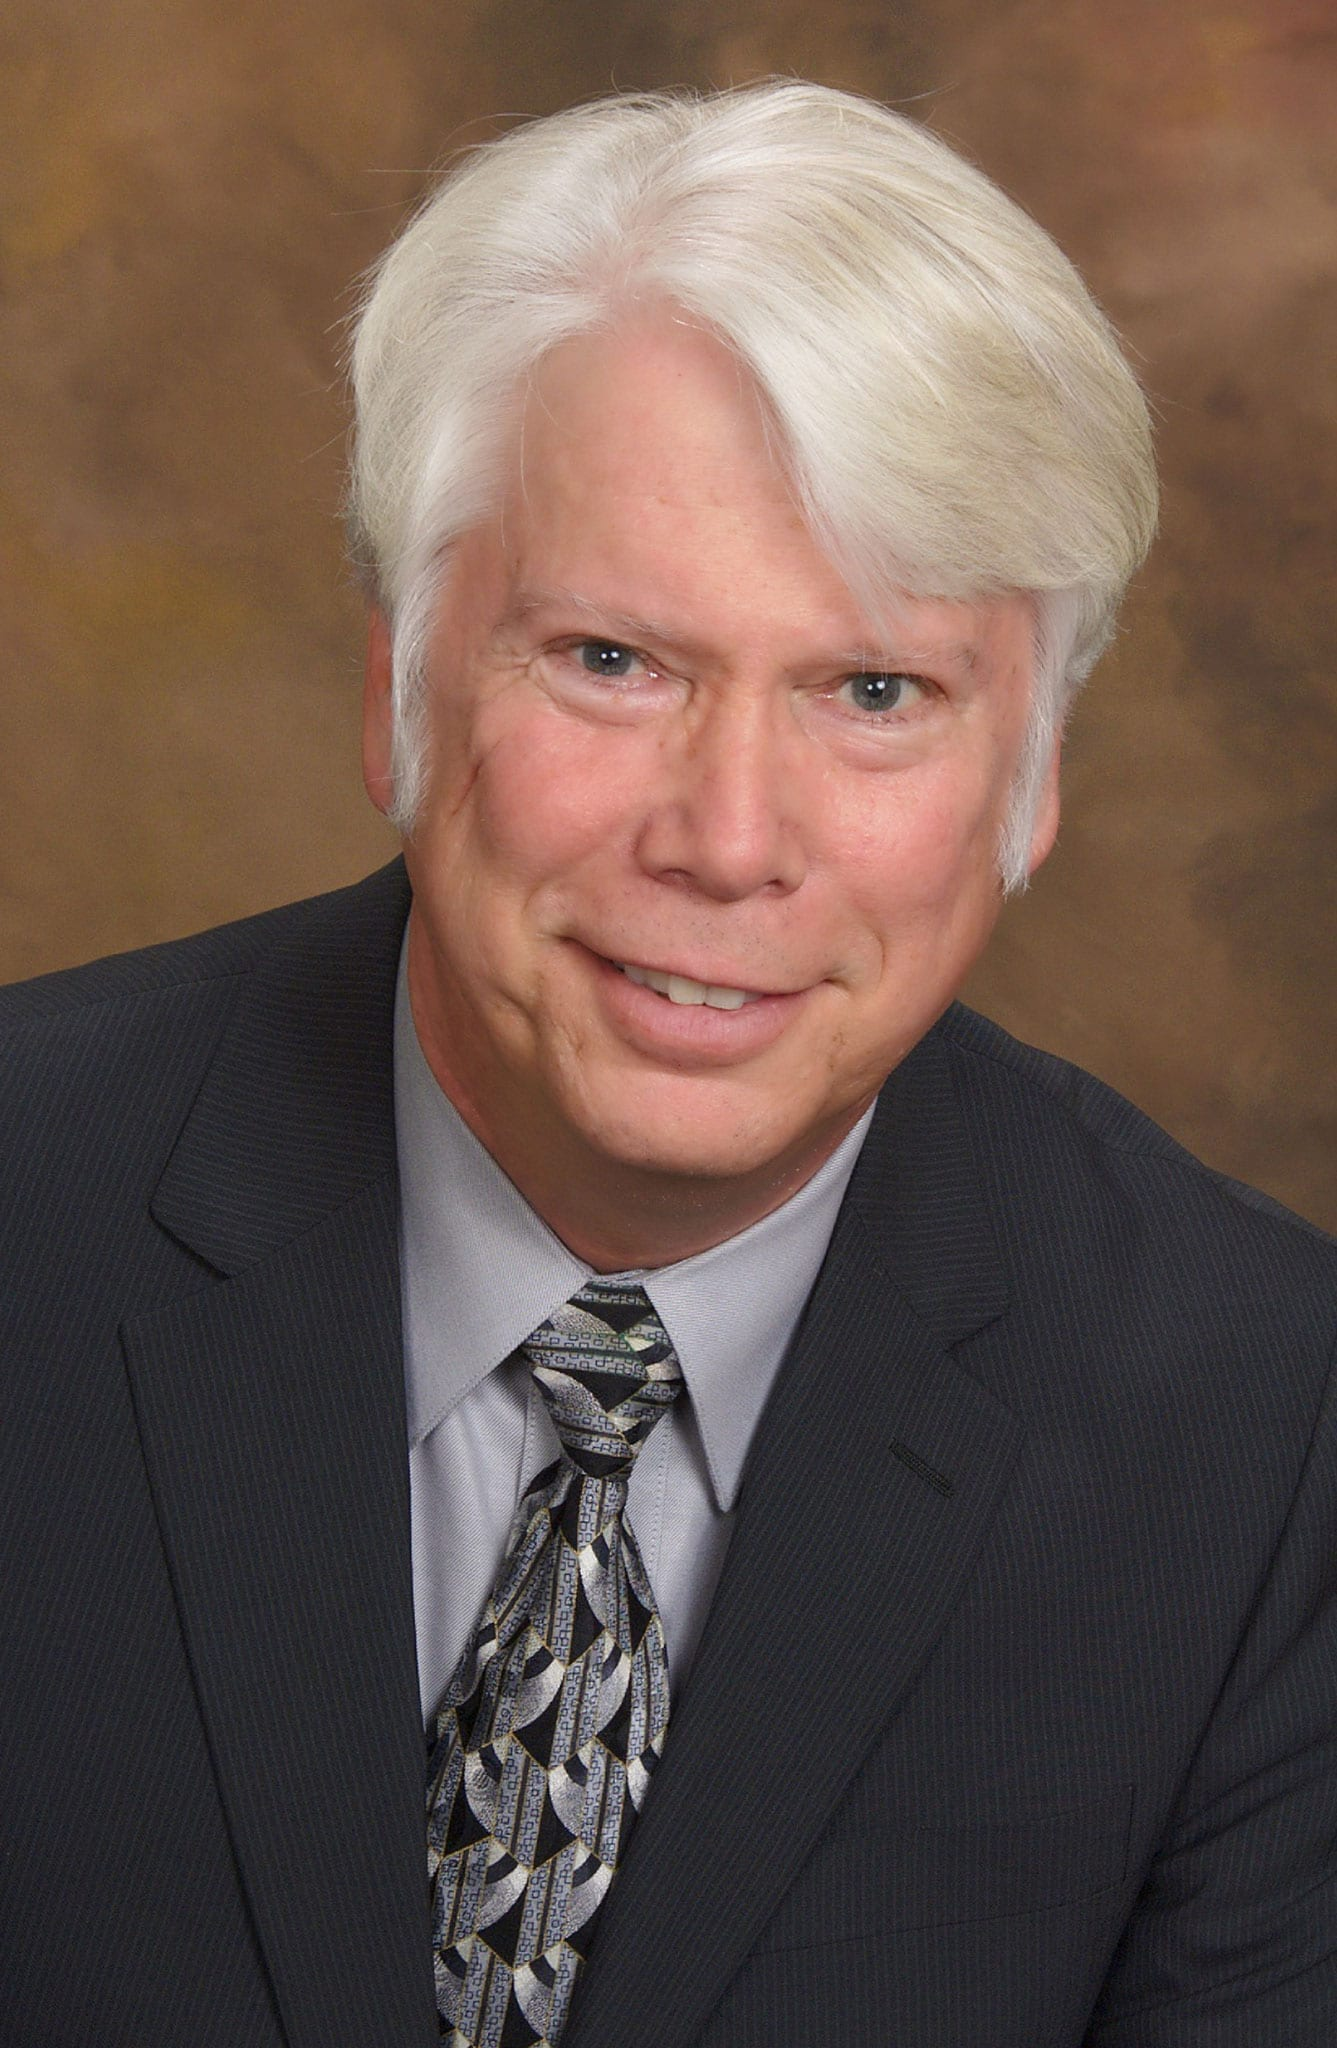 William Bolak DMD - Plano Endodontist - Endodontist Plano TX - Root Canal Plano - Plano Root Canal - Endodontic Associates of Plano